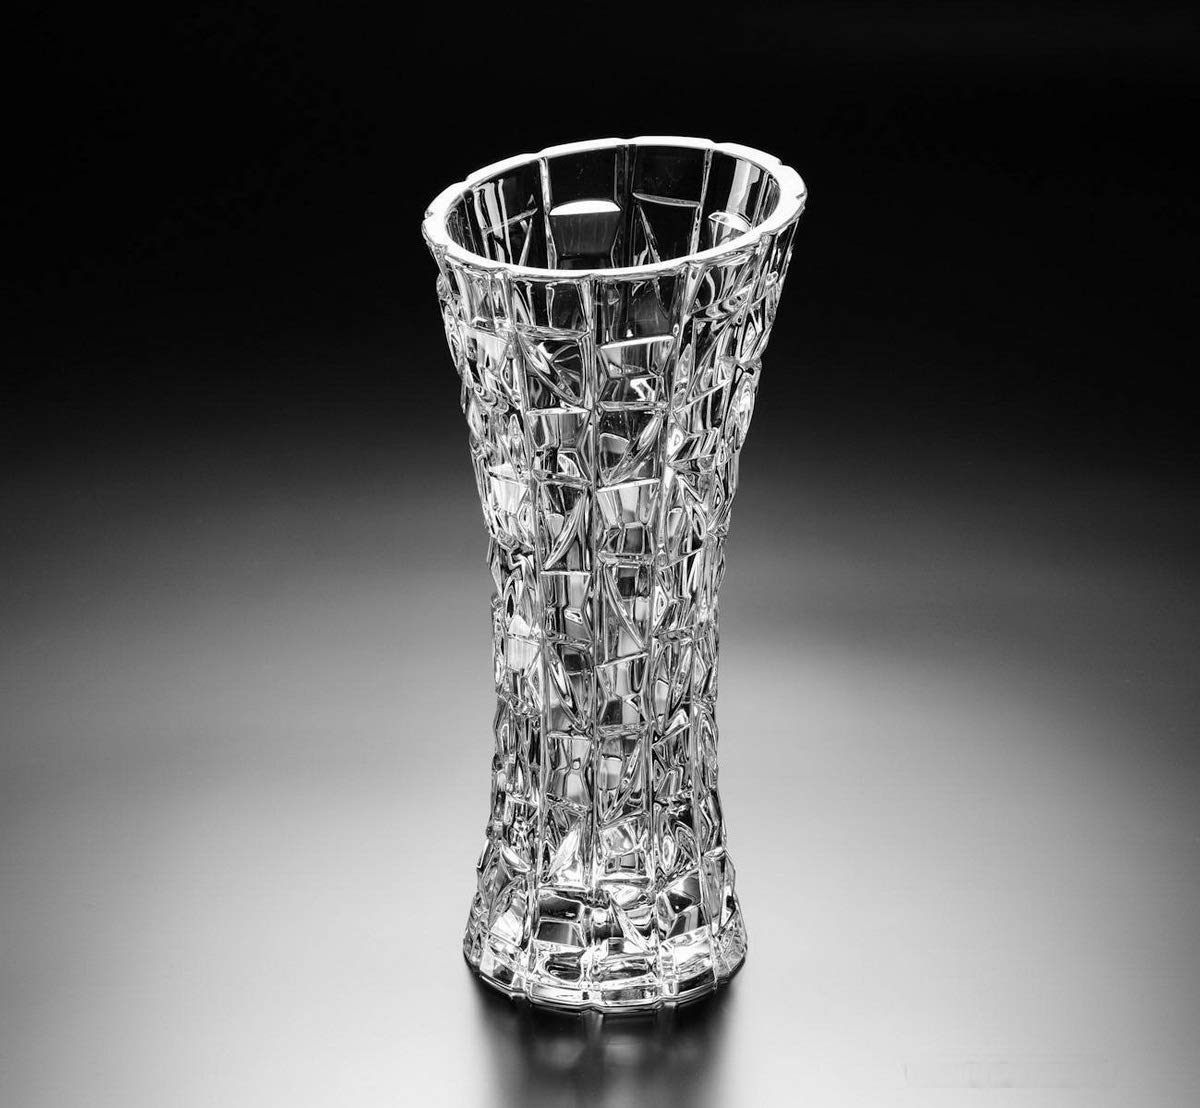 NGEL Glass Flower Pot, Crystal Clear Vase for Living Room/Home/Office